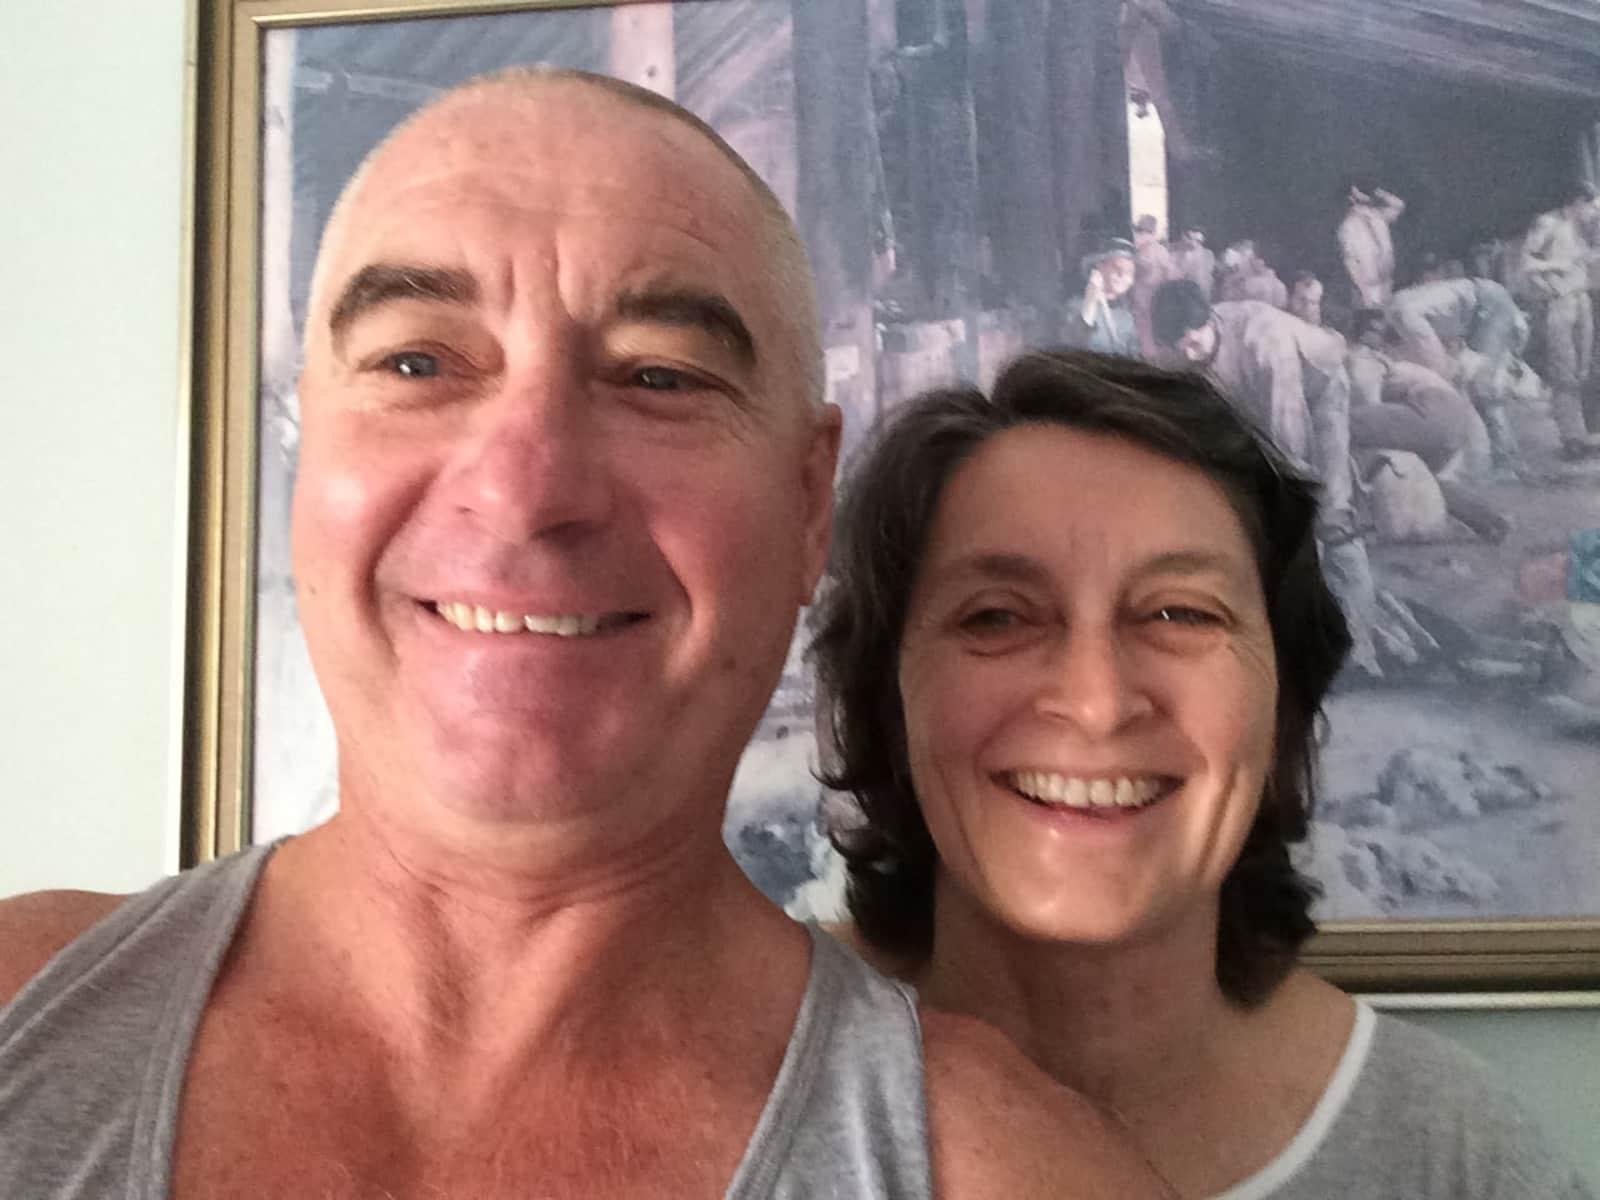 Lee from Mandurah, Western Australia, Australia